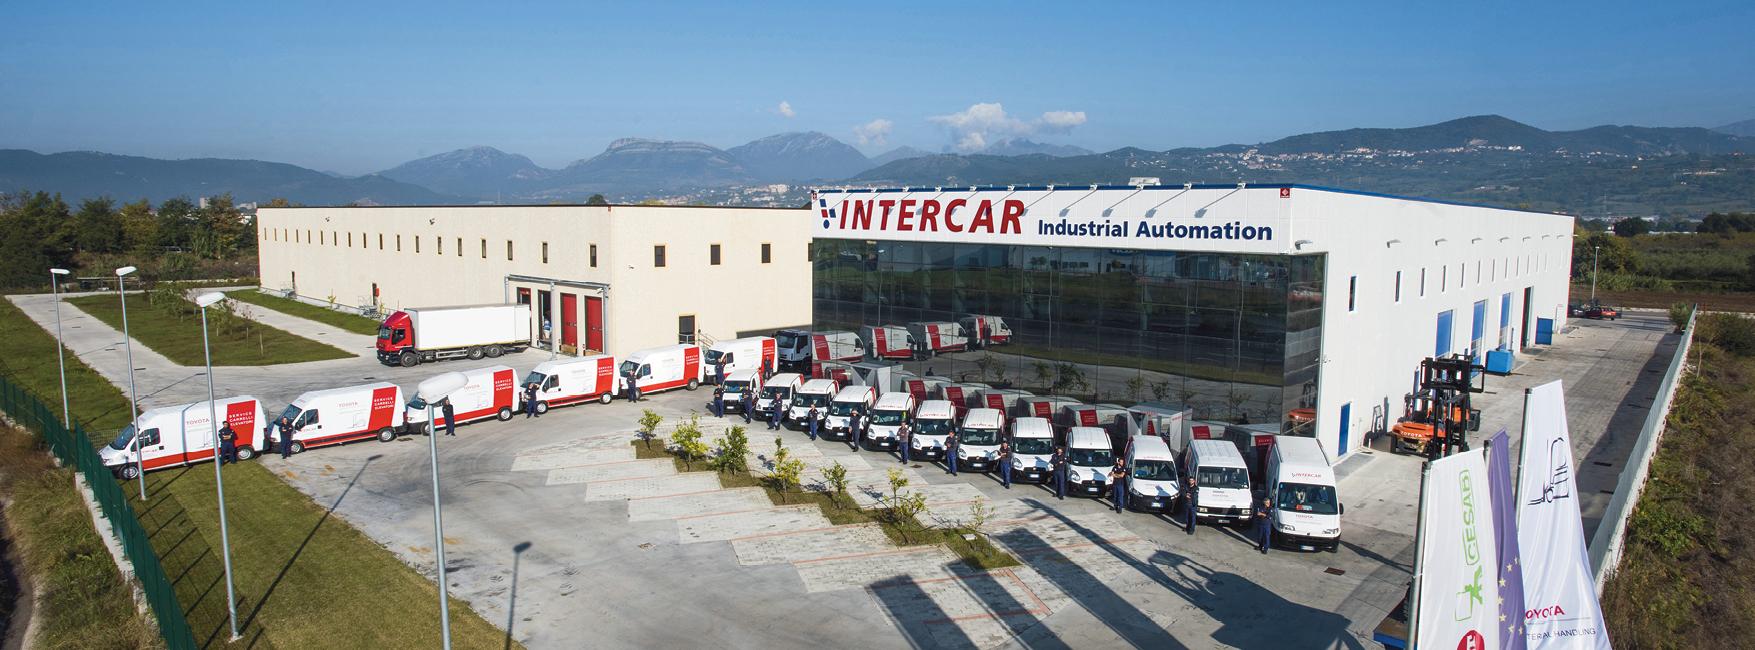 banner azienda Intercar